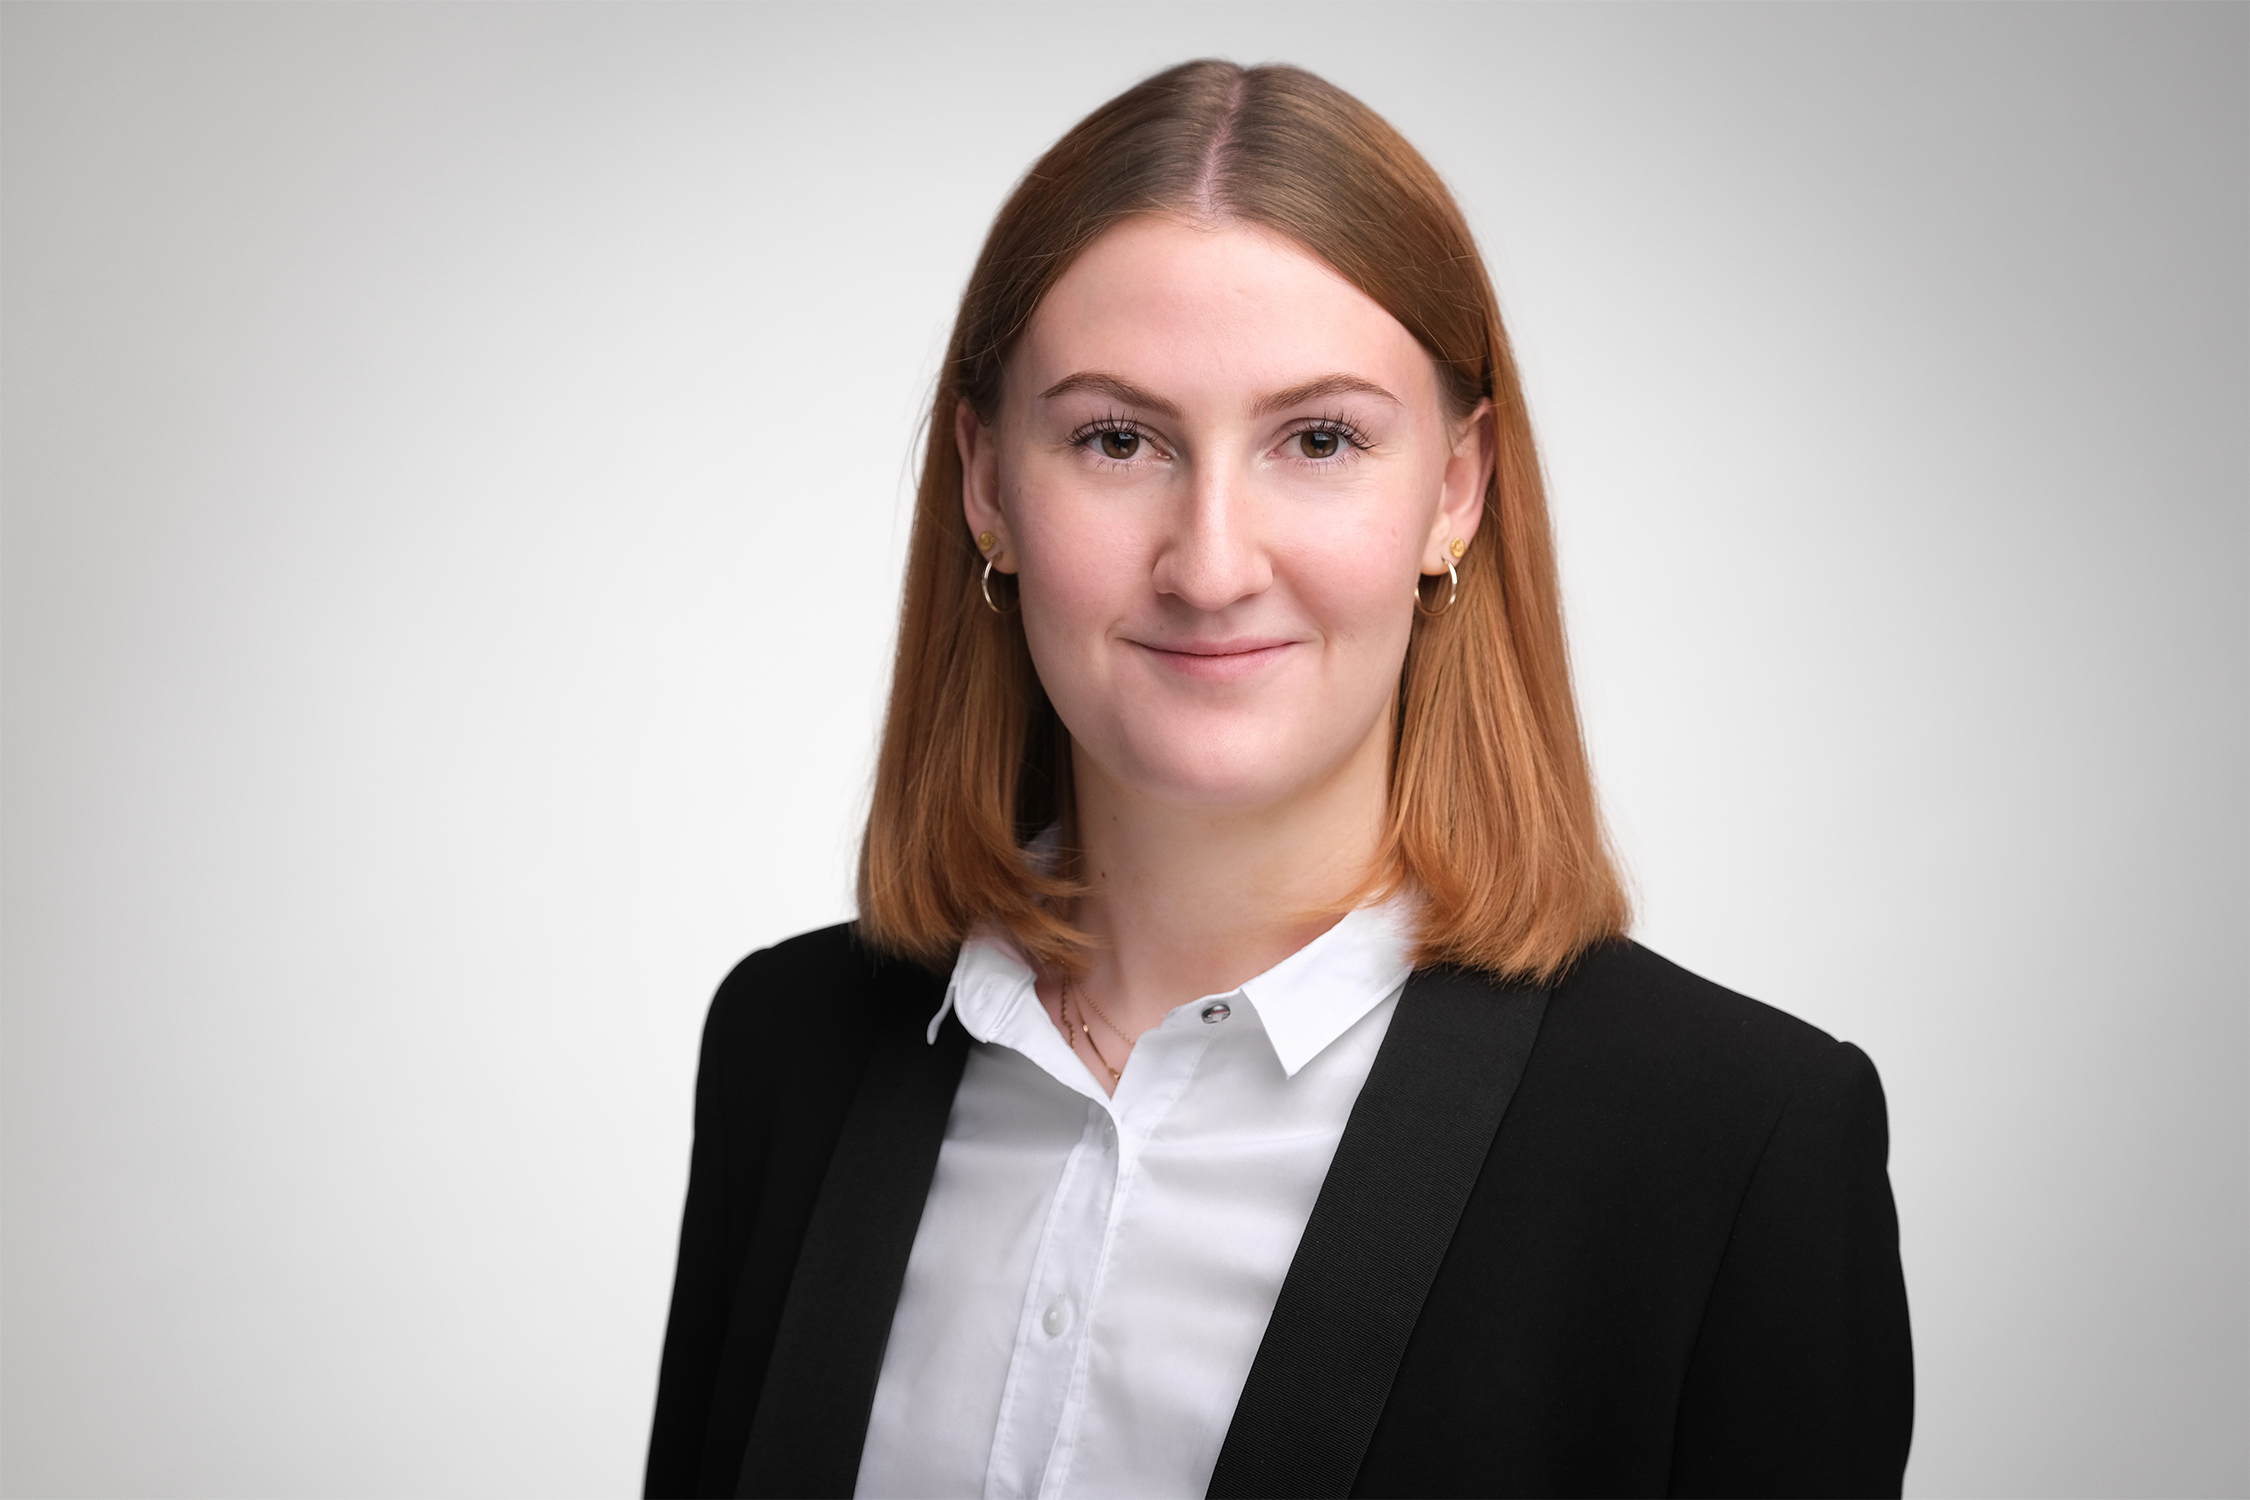 Marie-Isabell Herweg